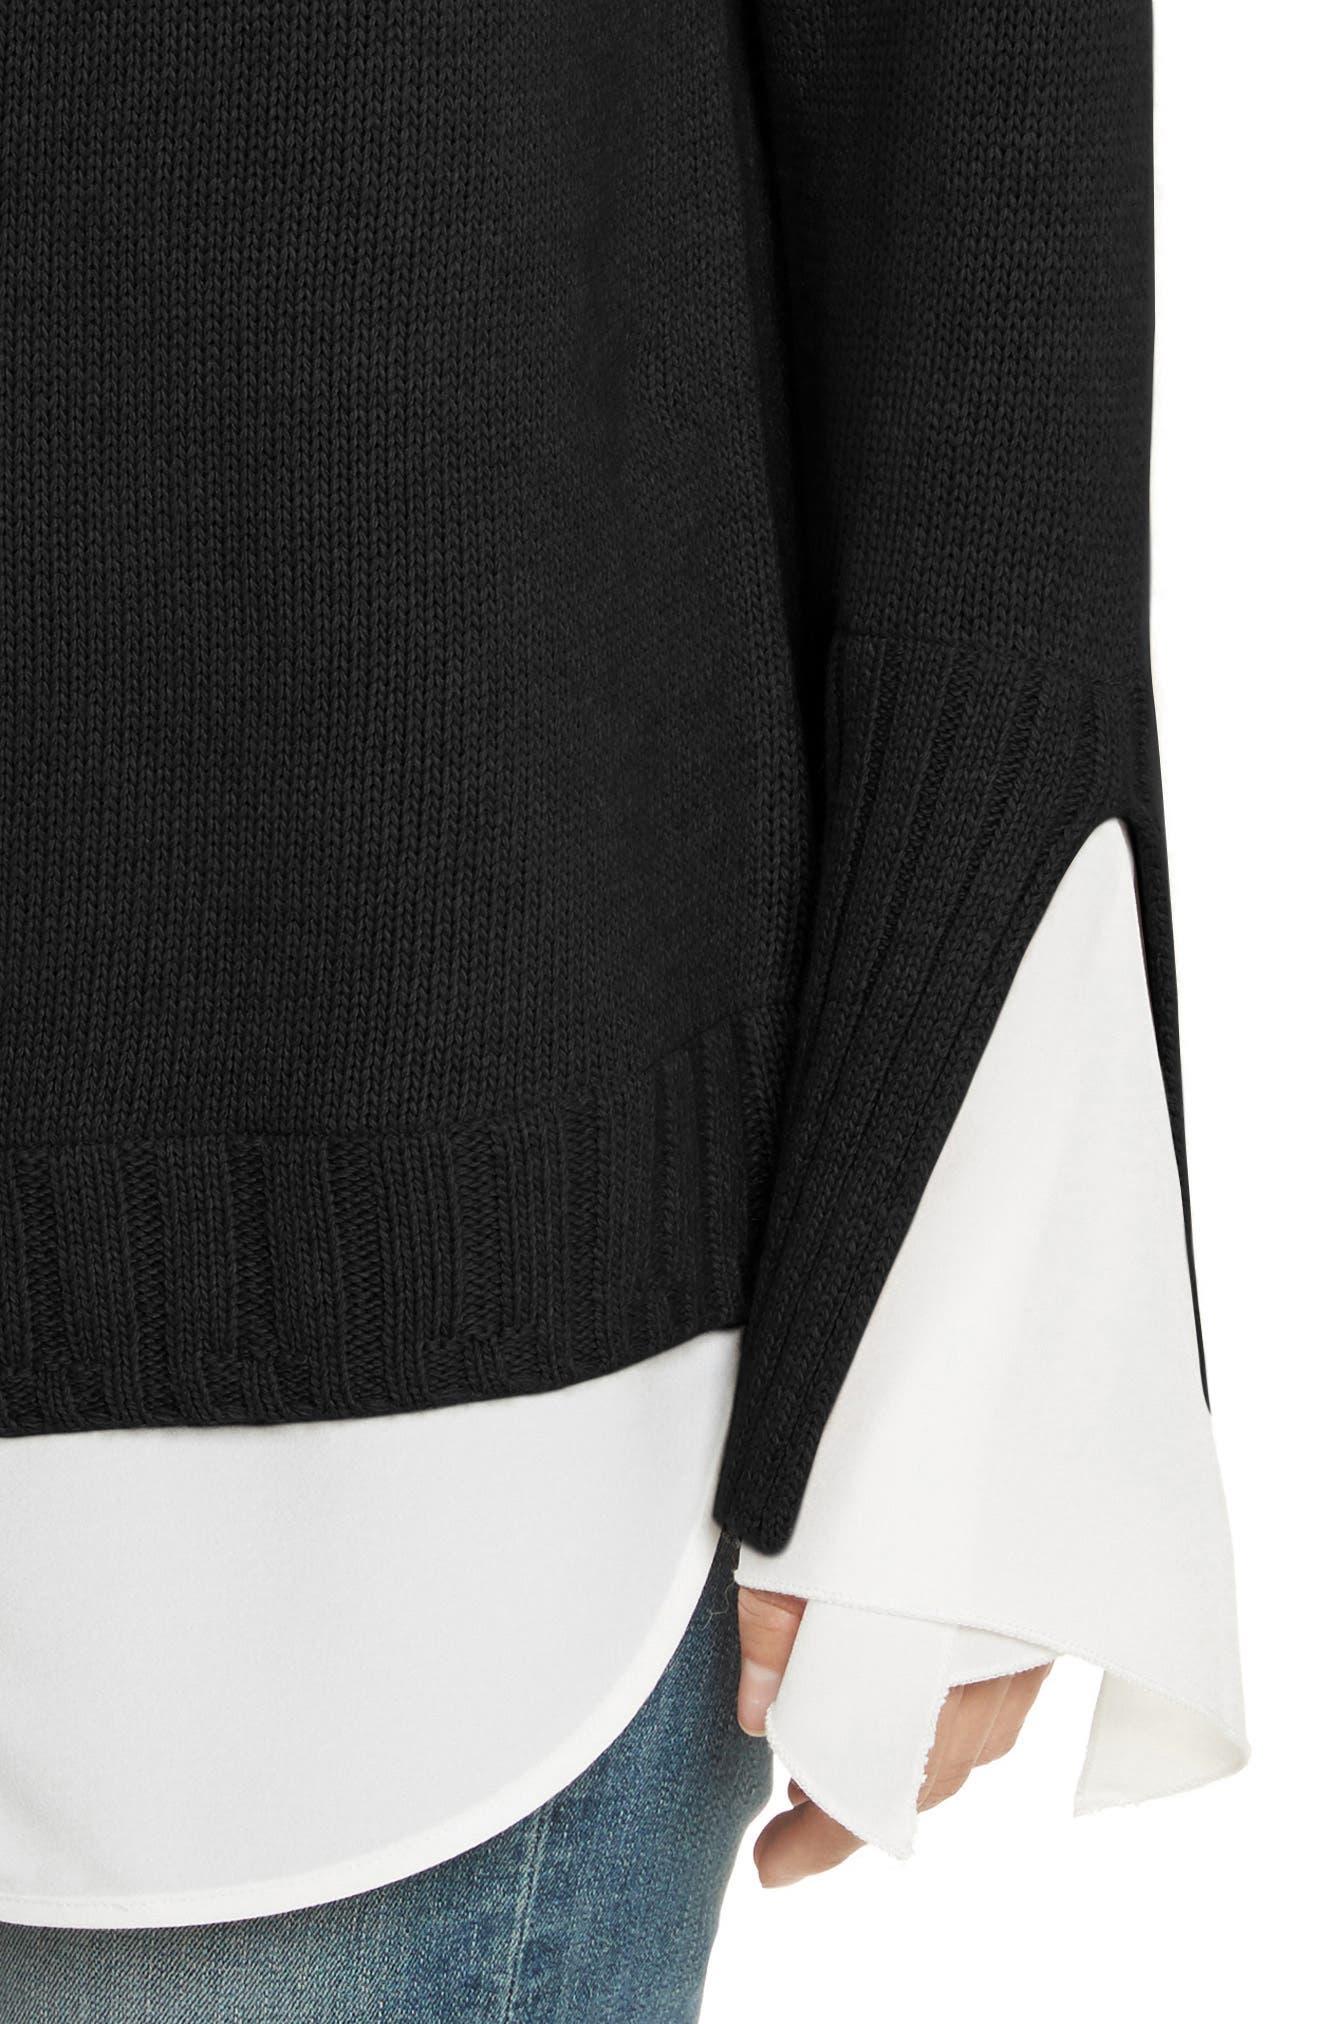 Remi Layered Pullover,                             Alternate thumbnail 4, color,                             Black/ White